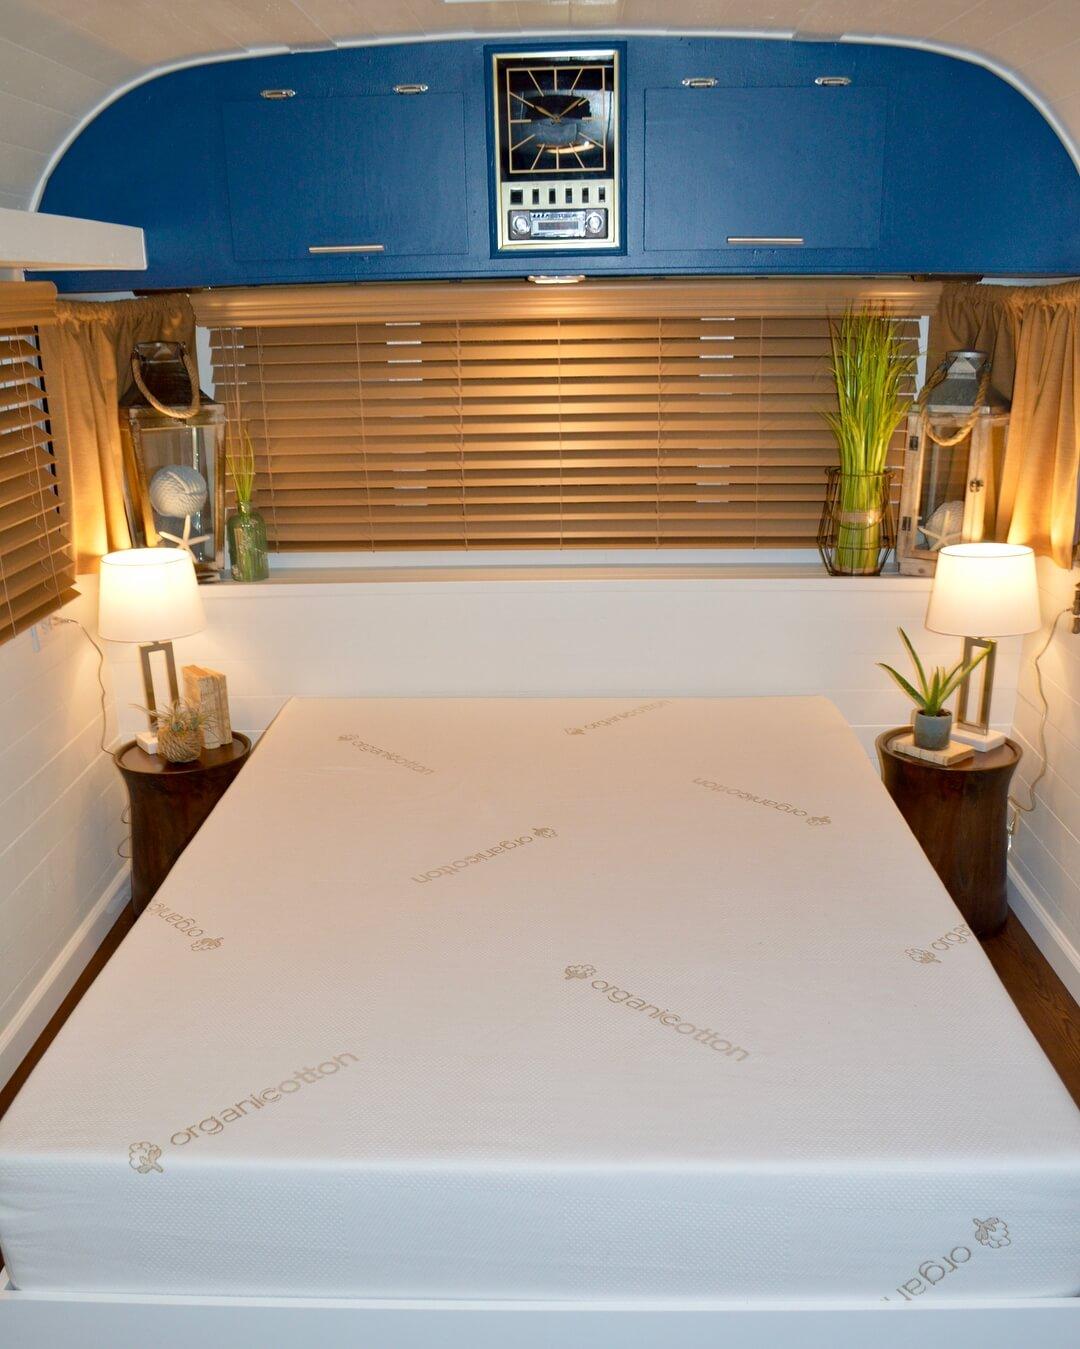 Sedona rv mattress